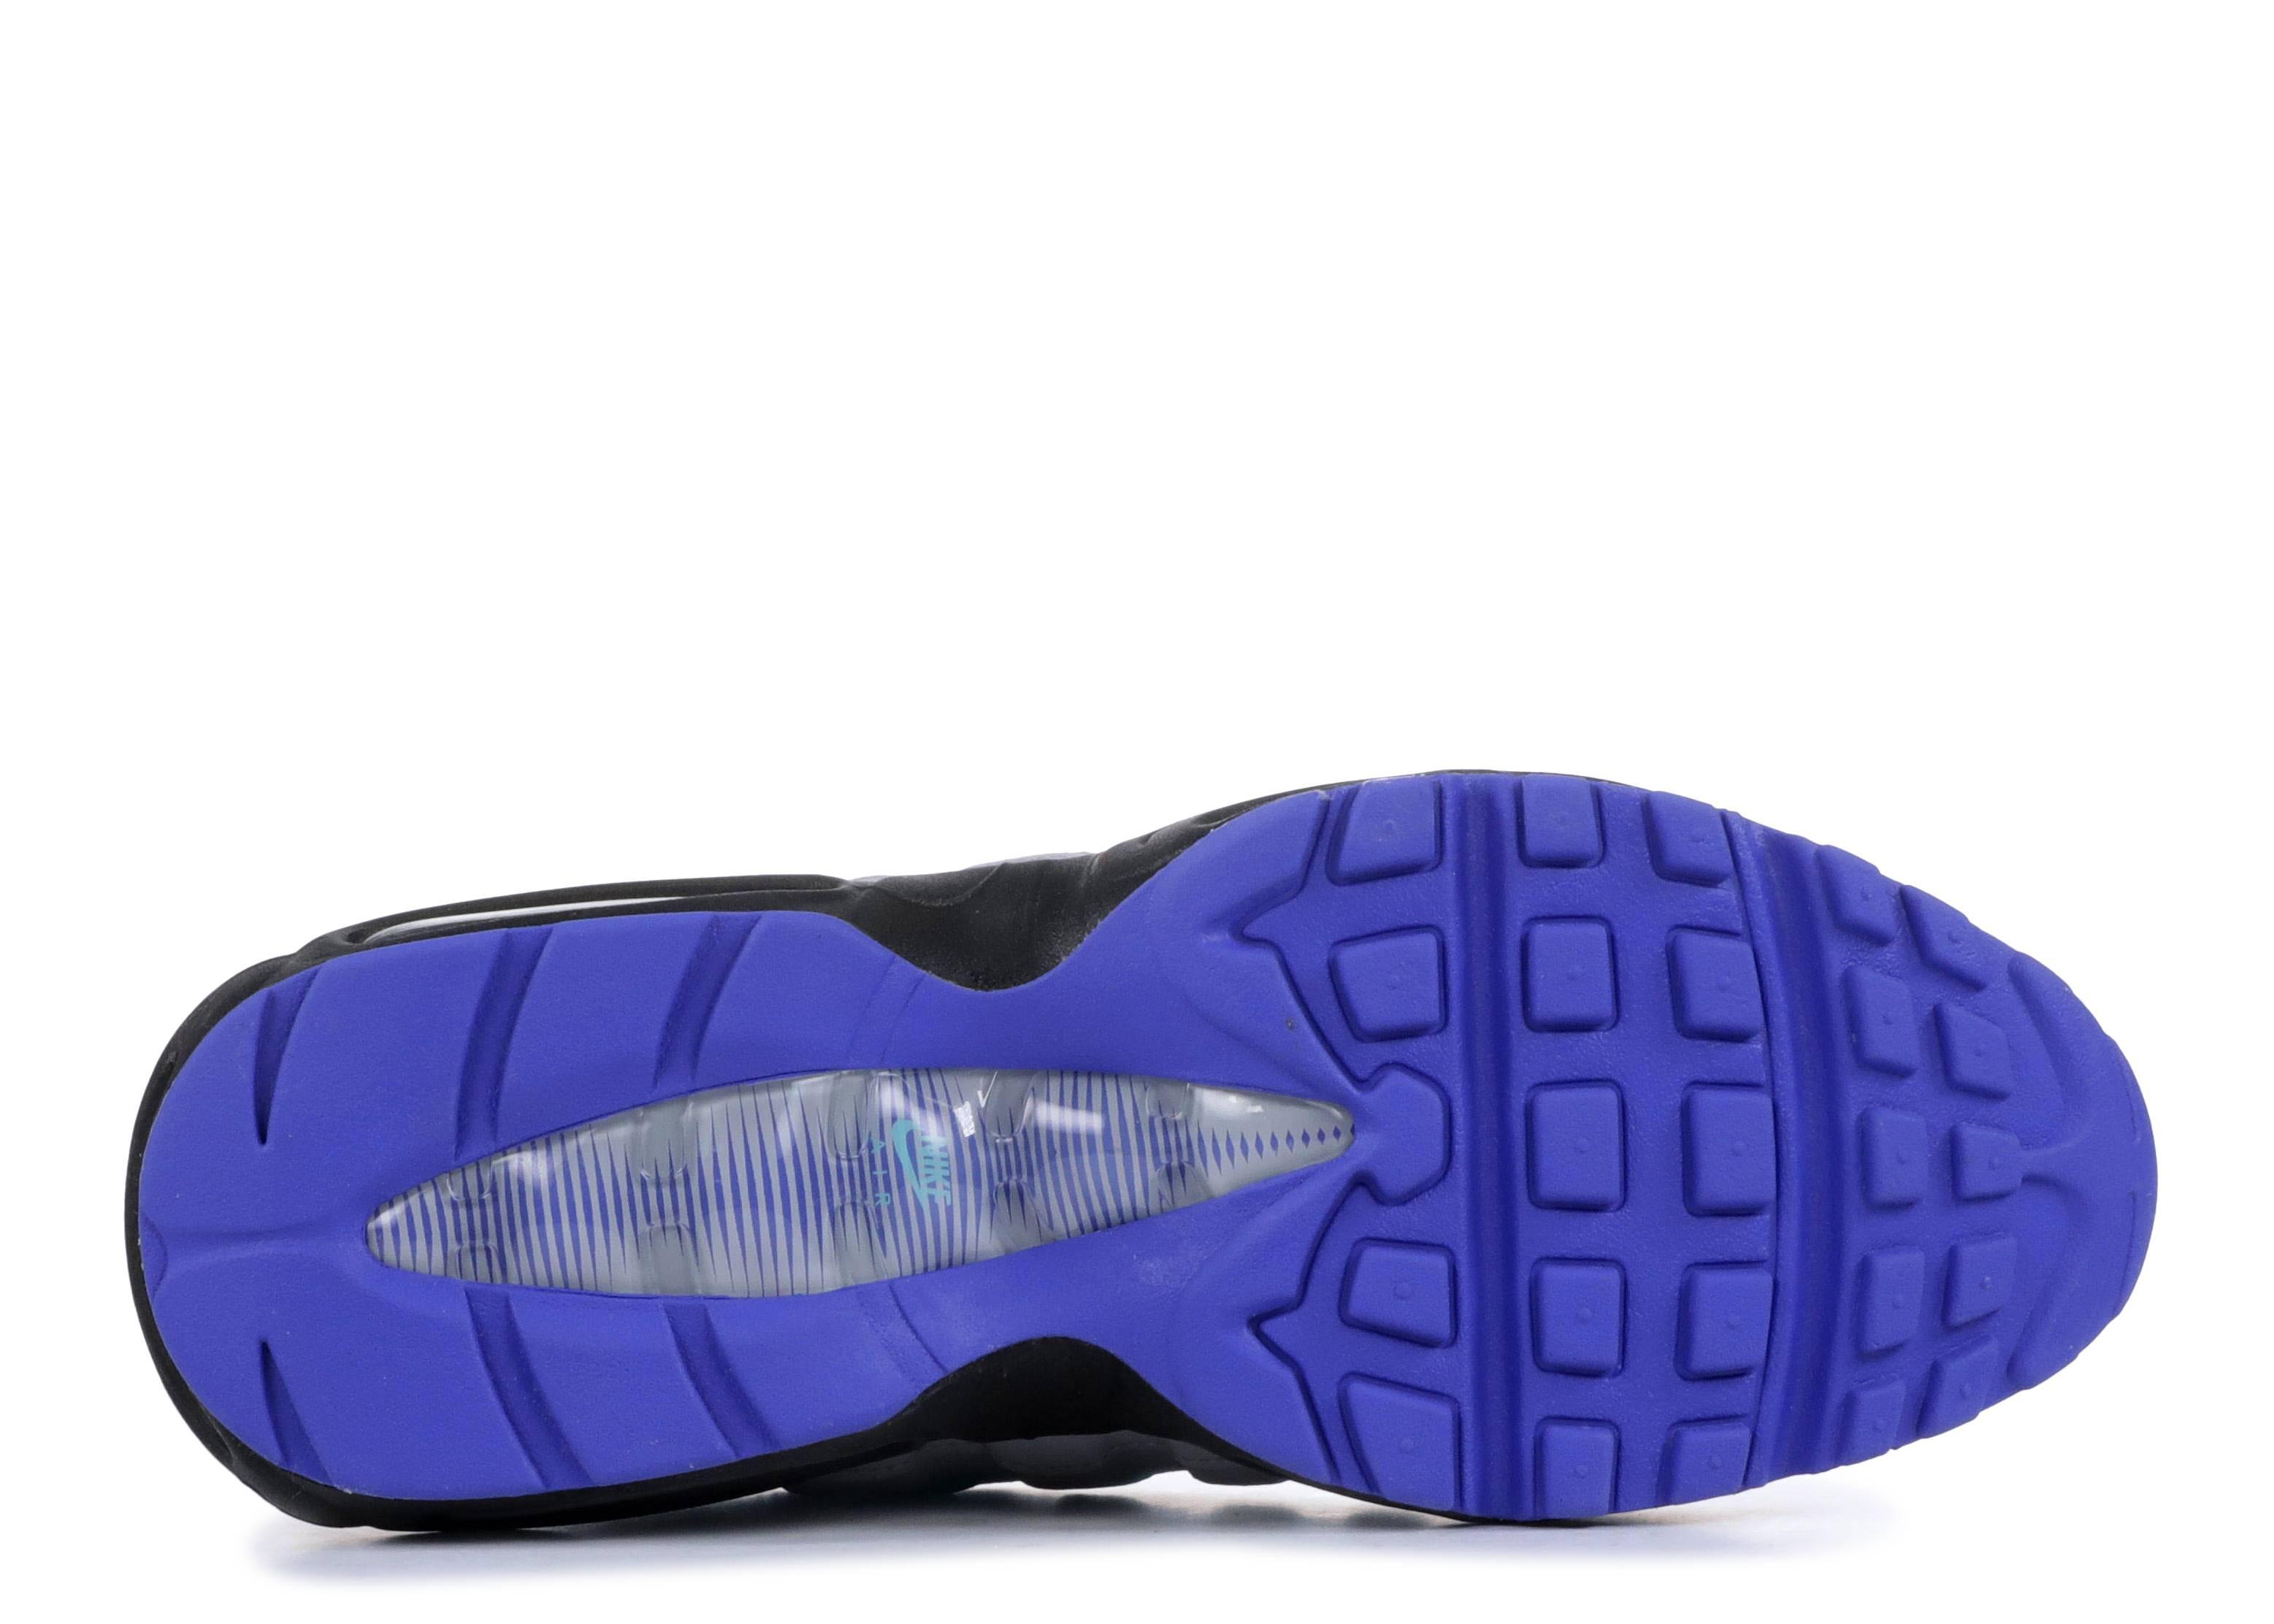 wholesale dealer 7fe95 04a9f Nike Air Max 95